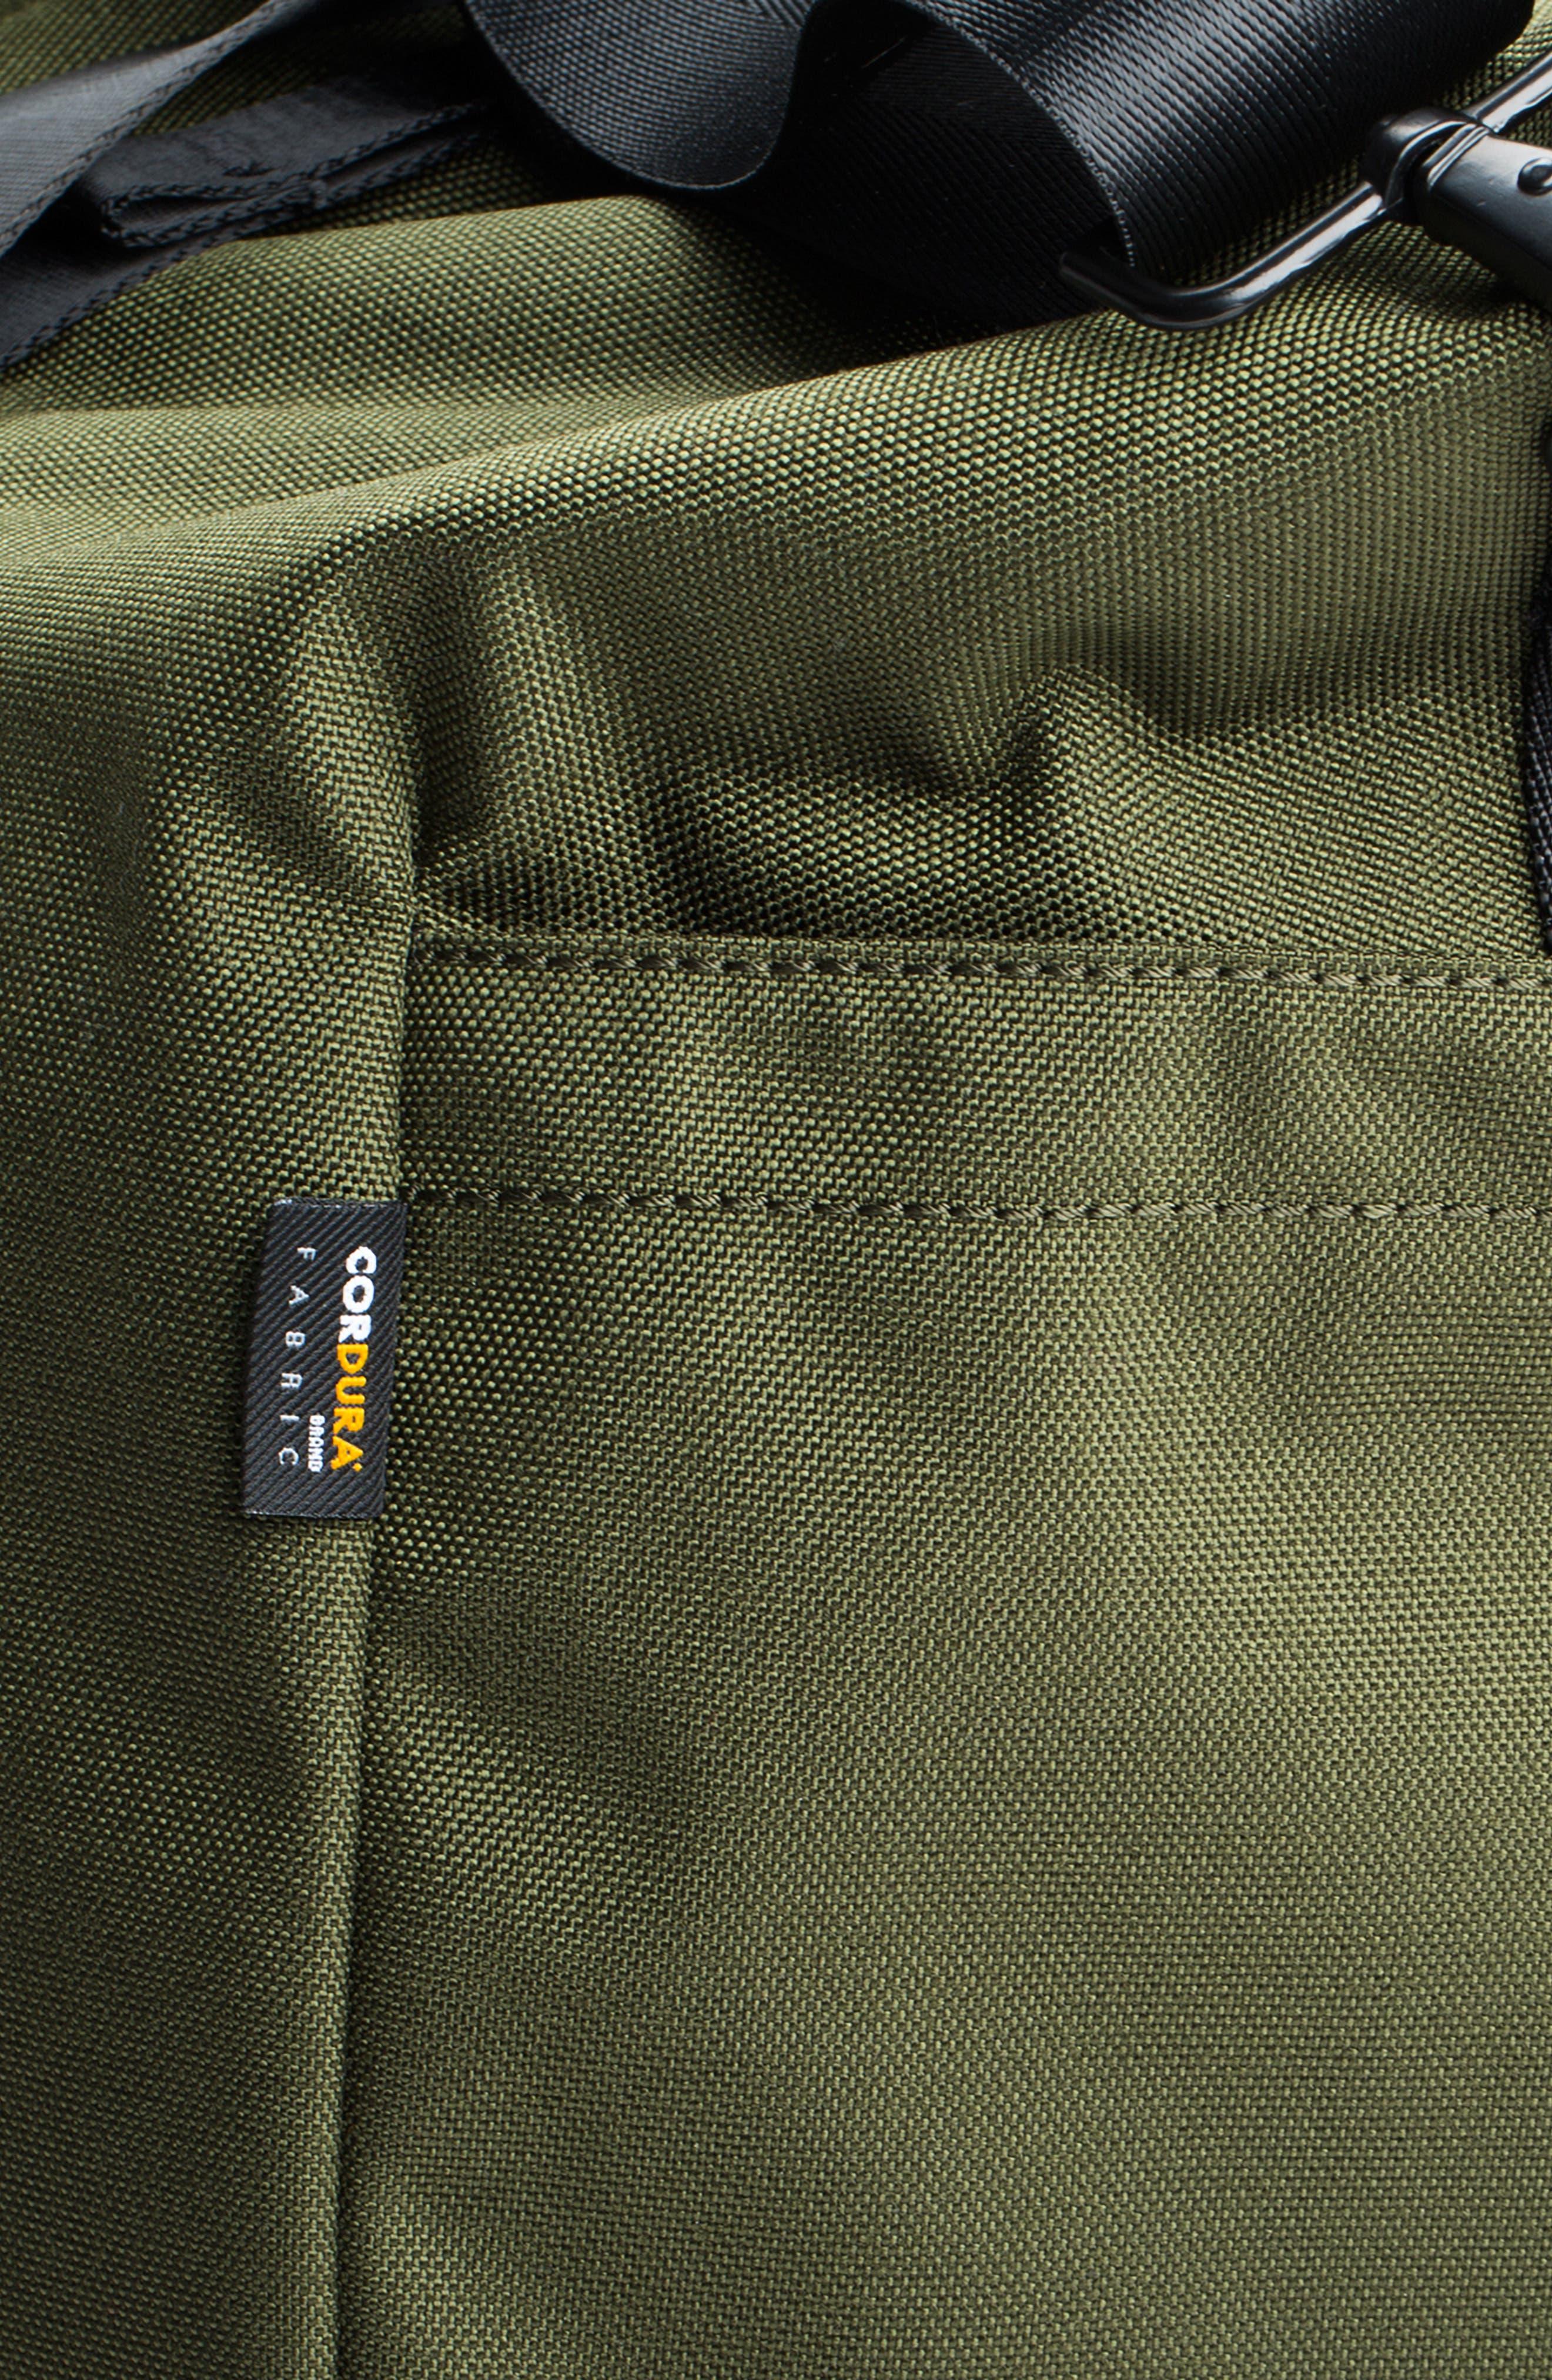 SWS 50L Roll Top Duffel Bag,                             Alternate thumbnail 9, color,                             OLIVE